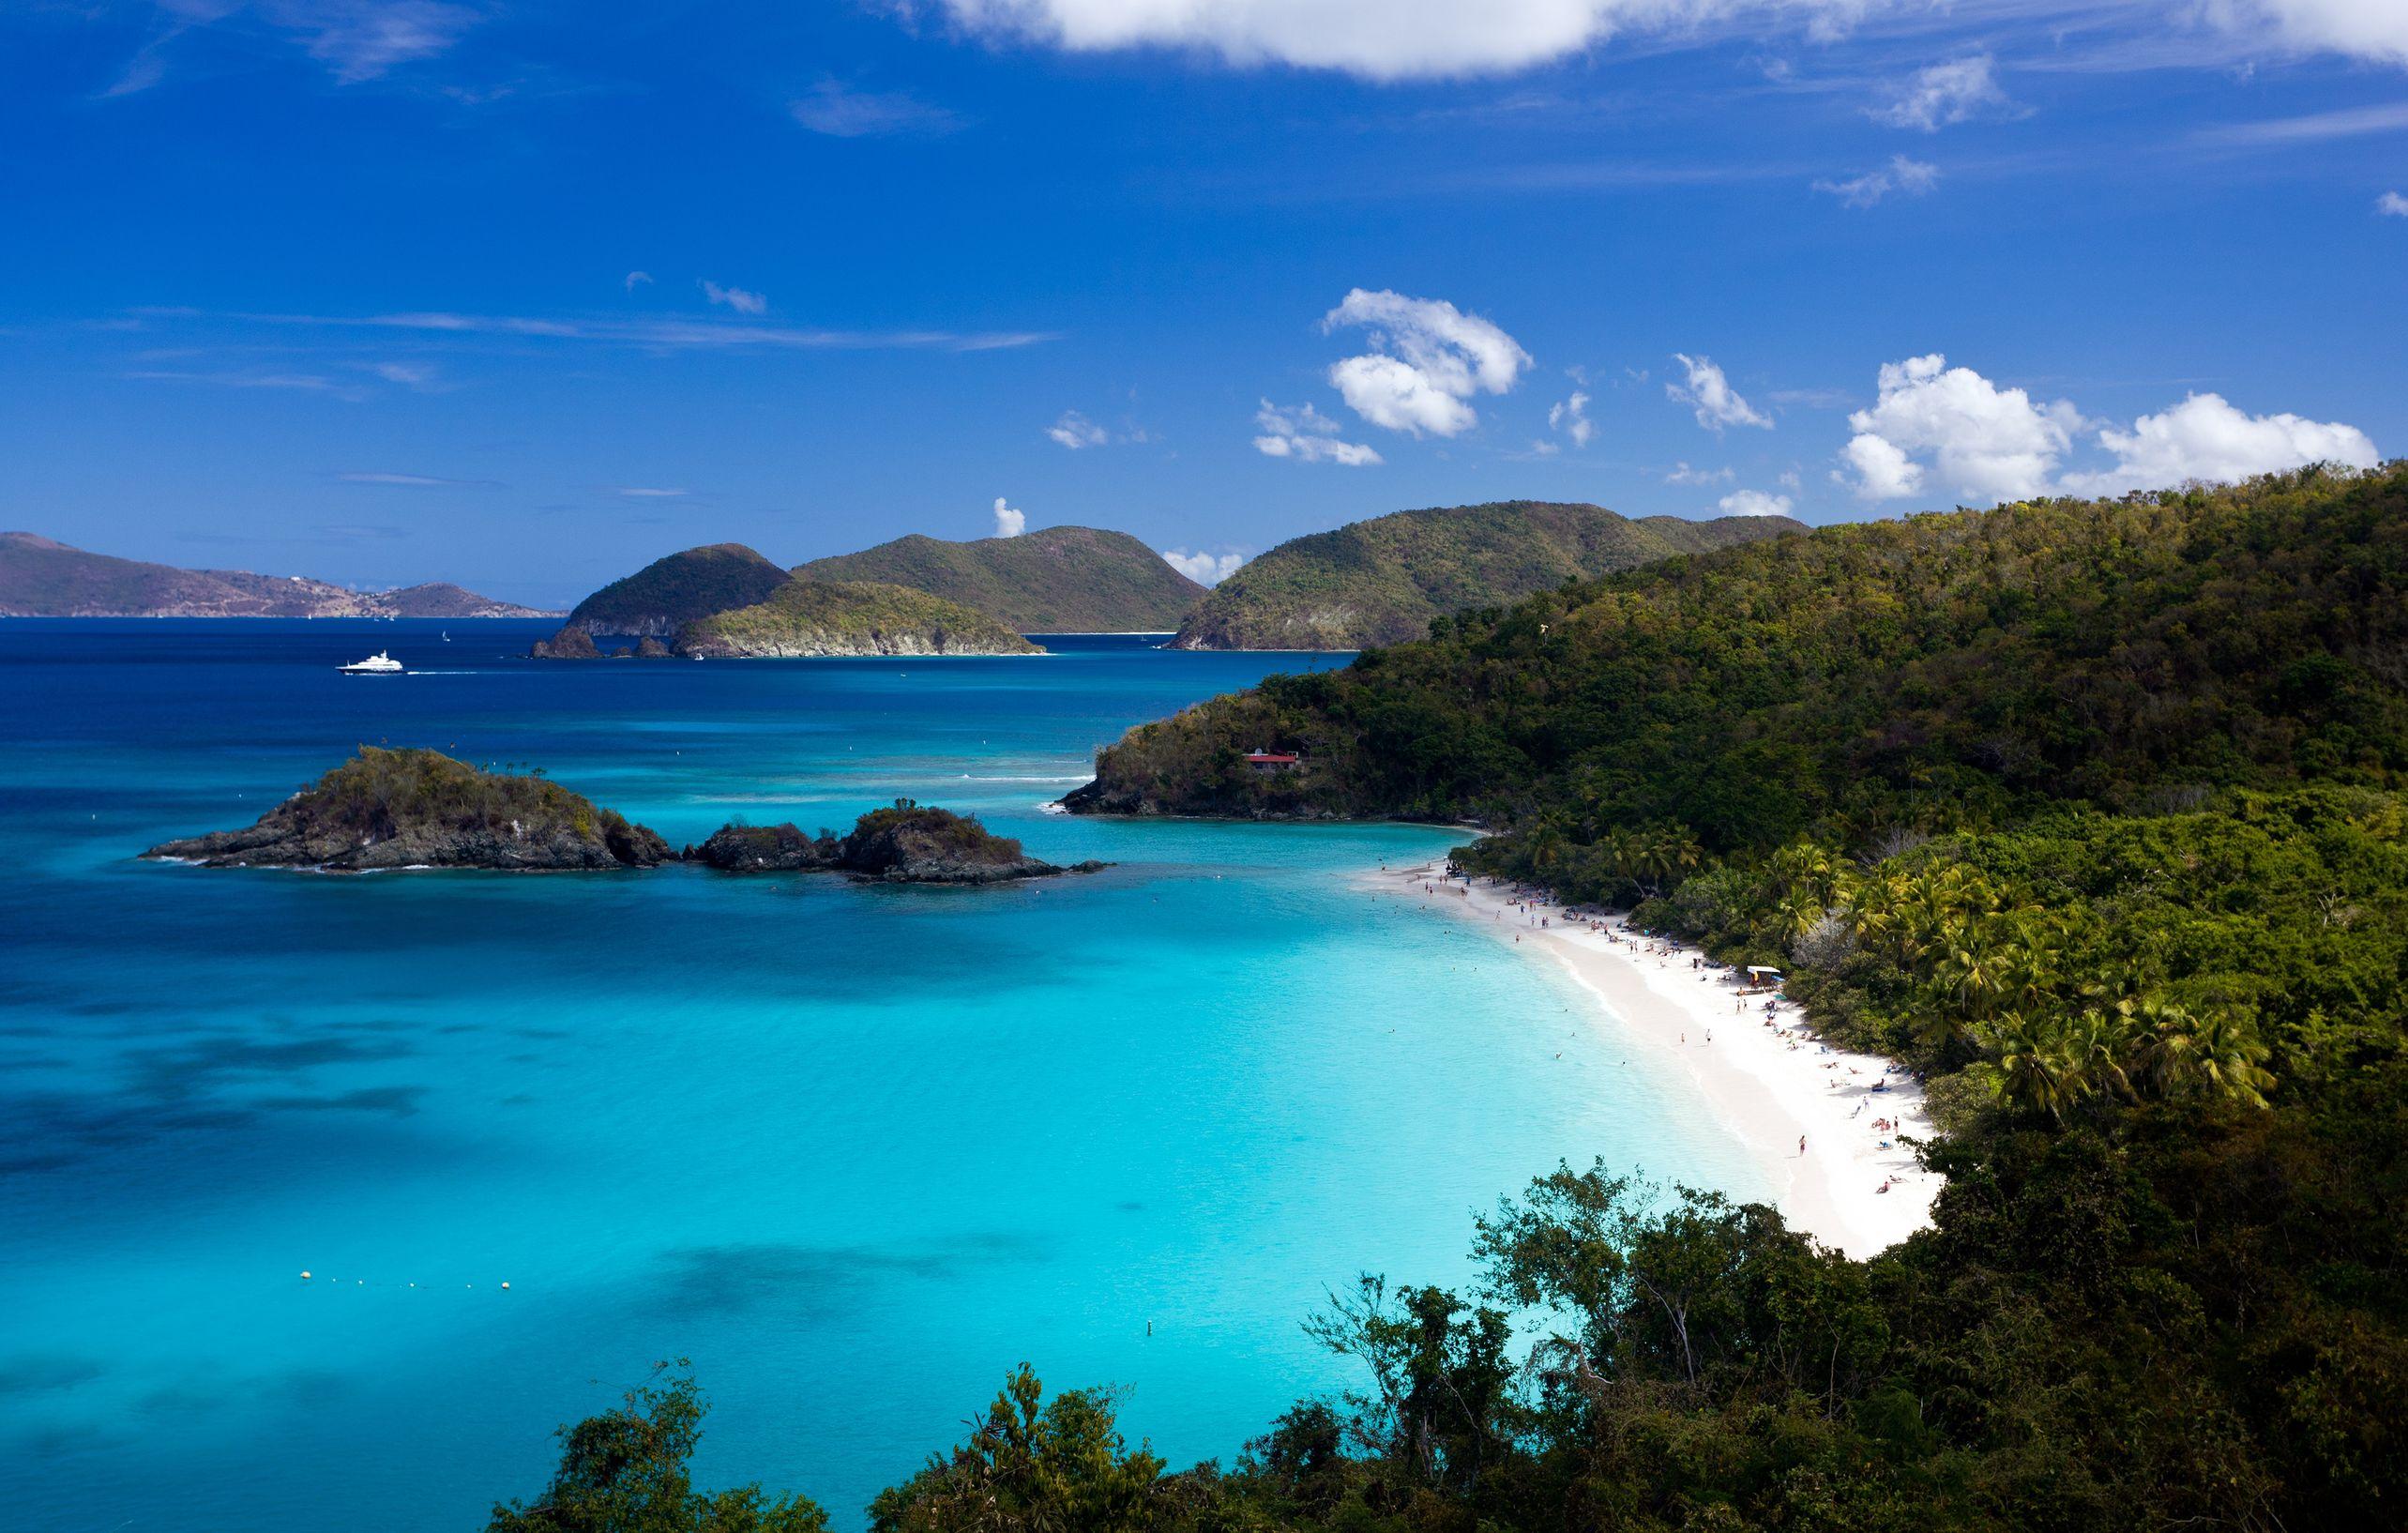 caribbean blue water bay 123rf